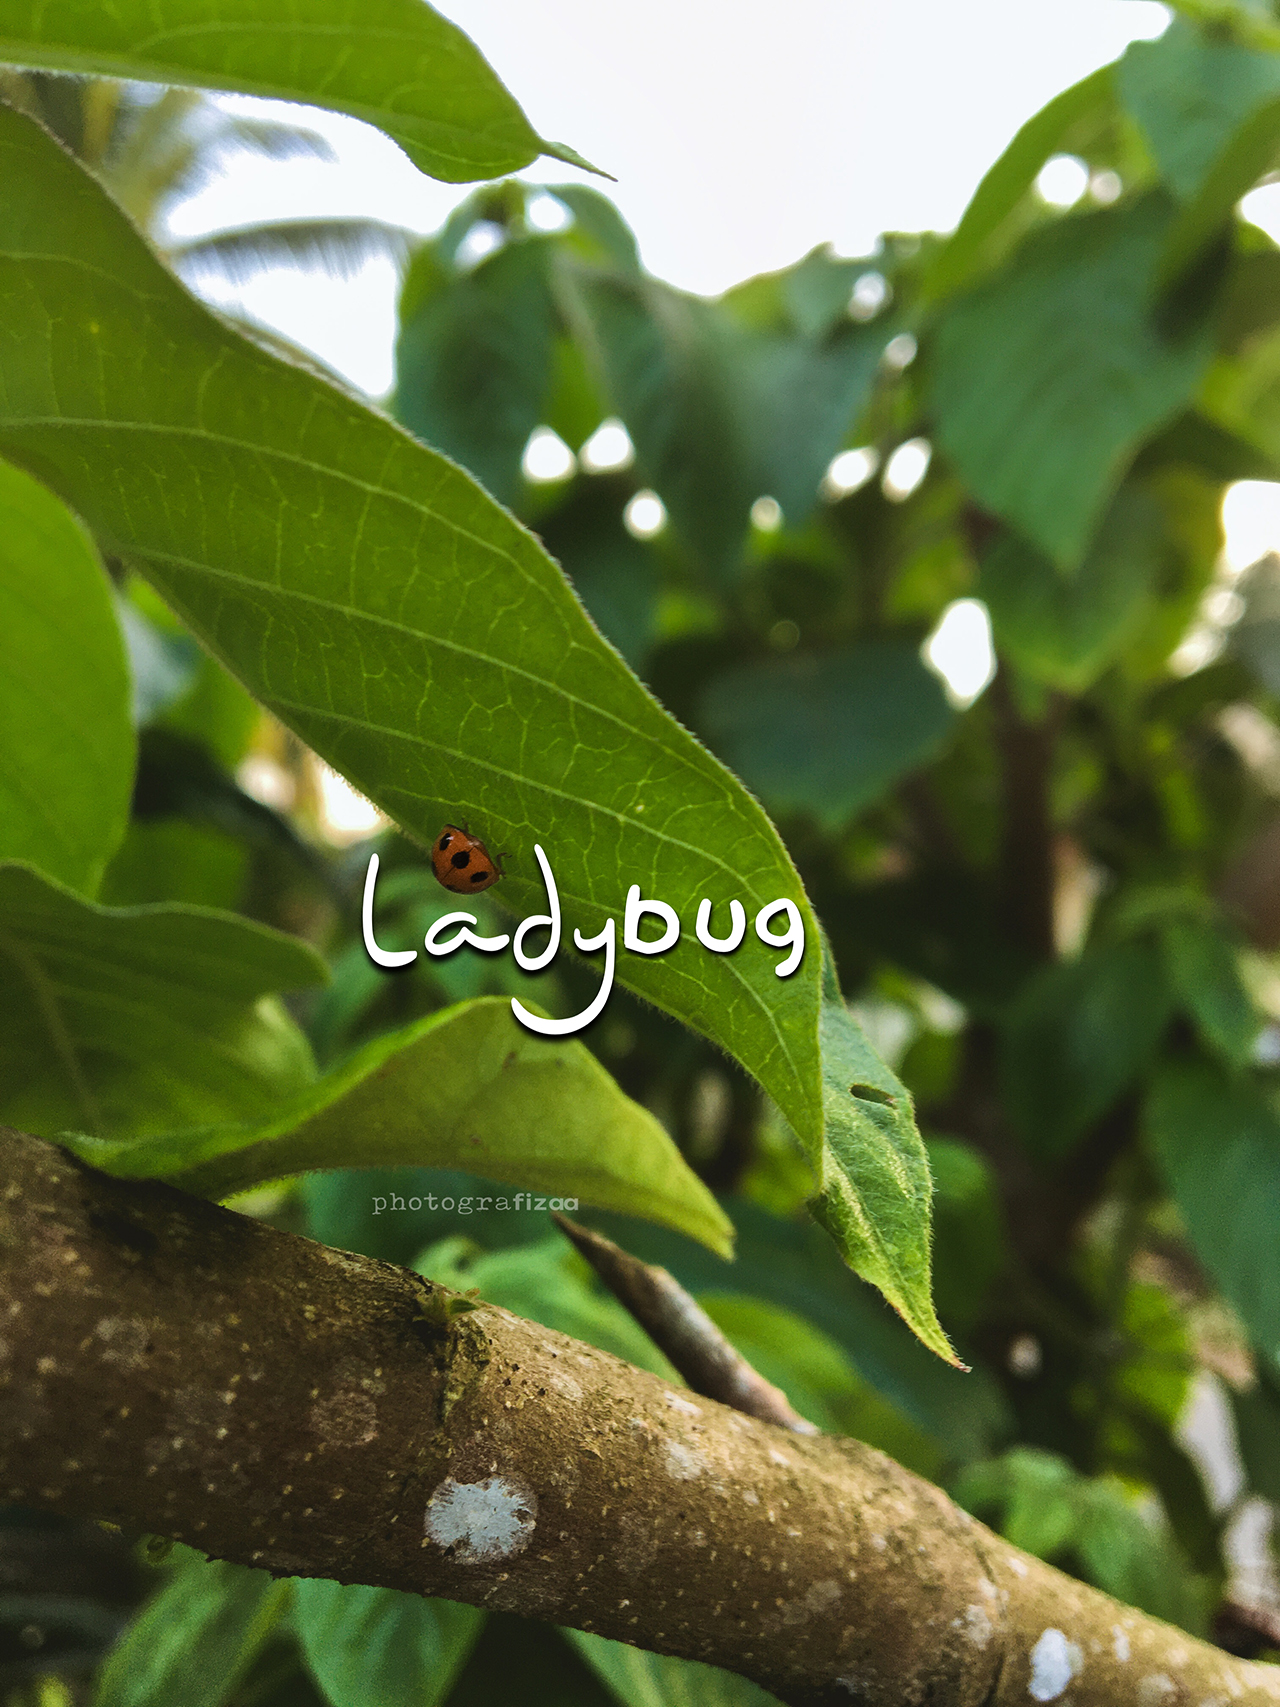 Ladybug atau ladybird